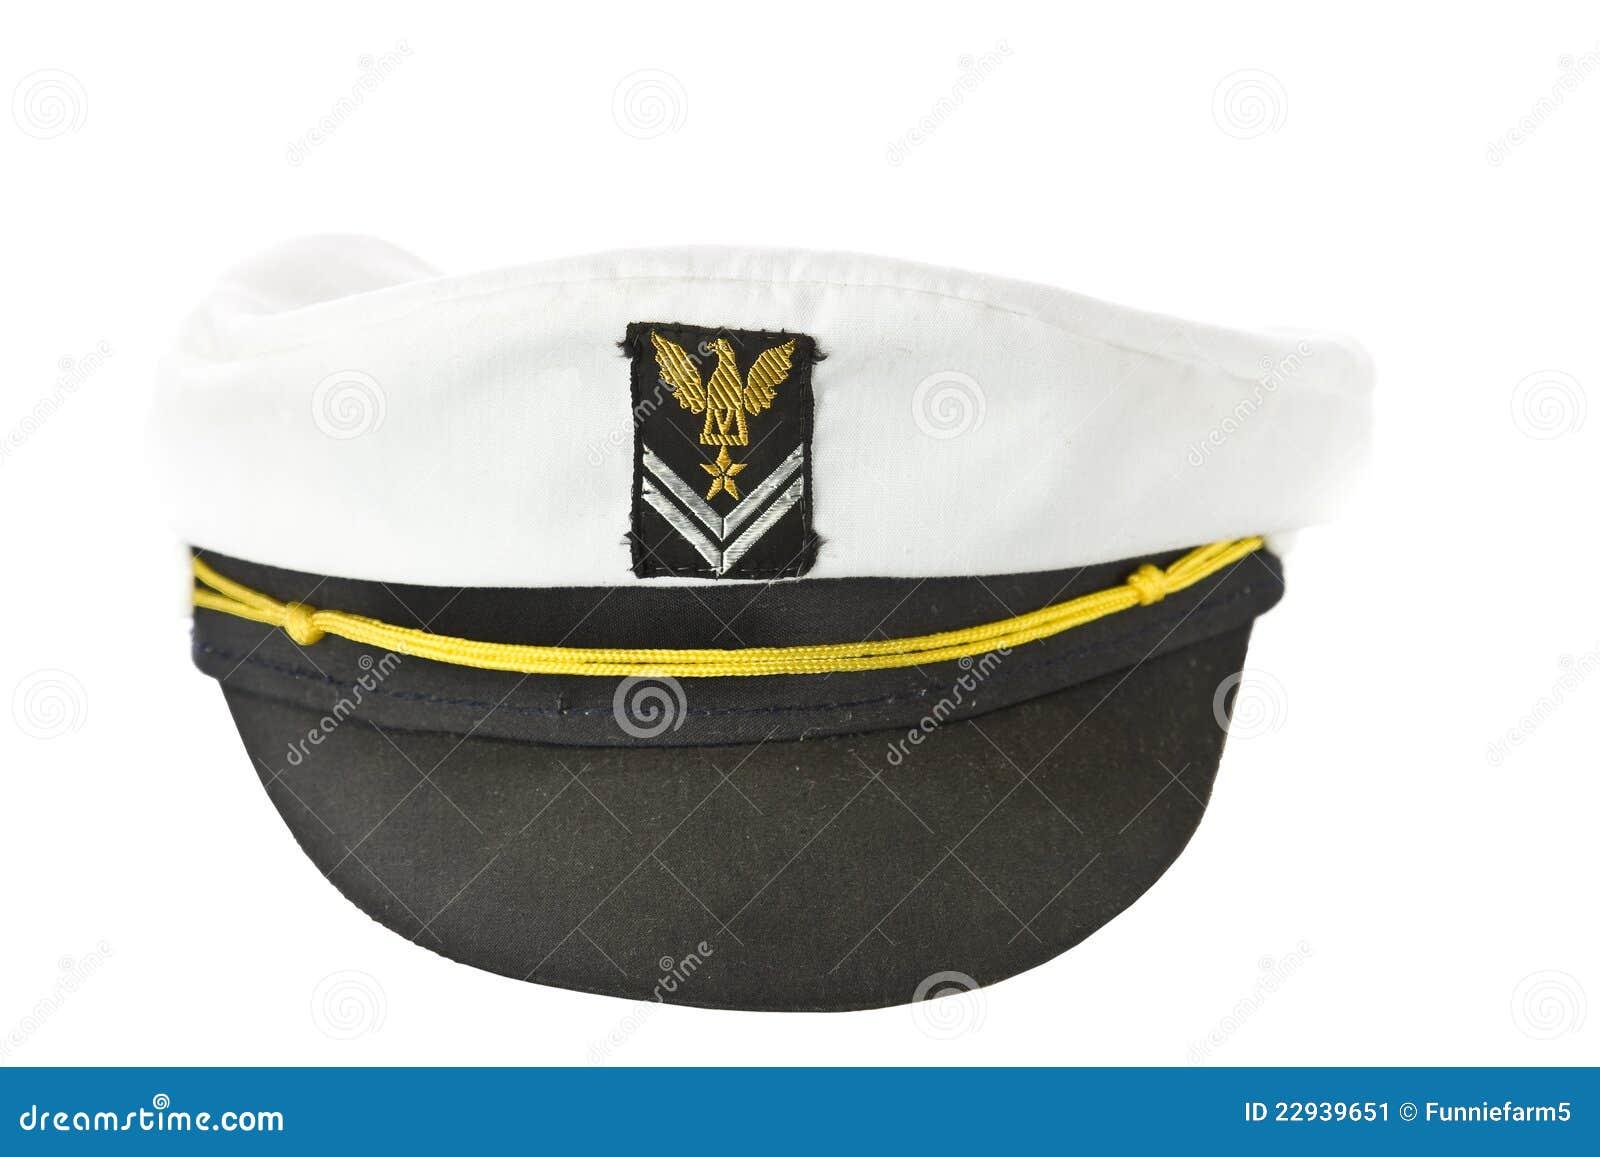 White Nautical hat isolated on white